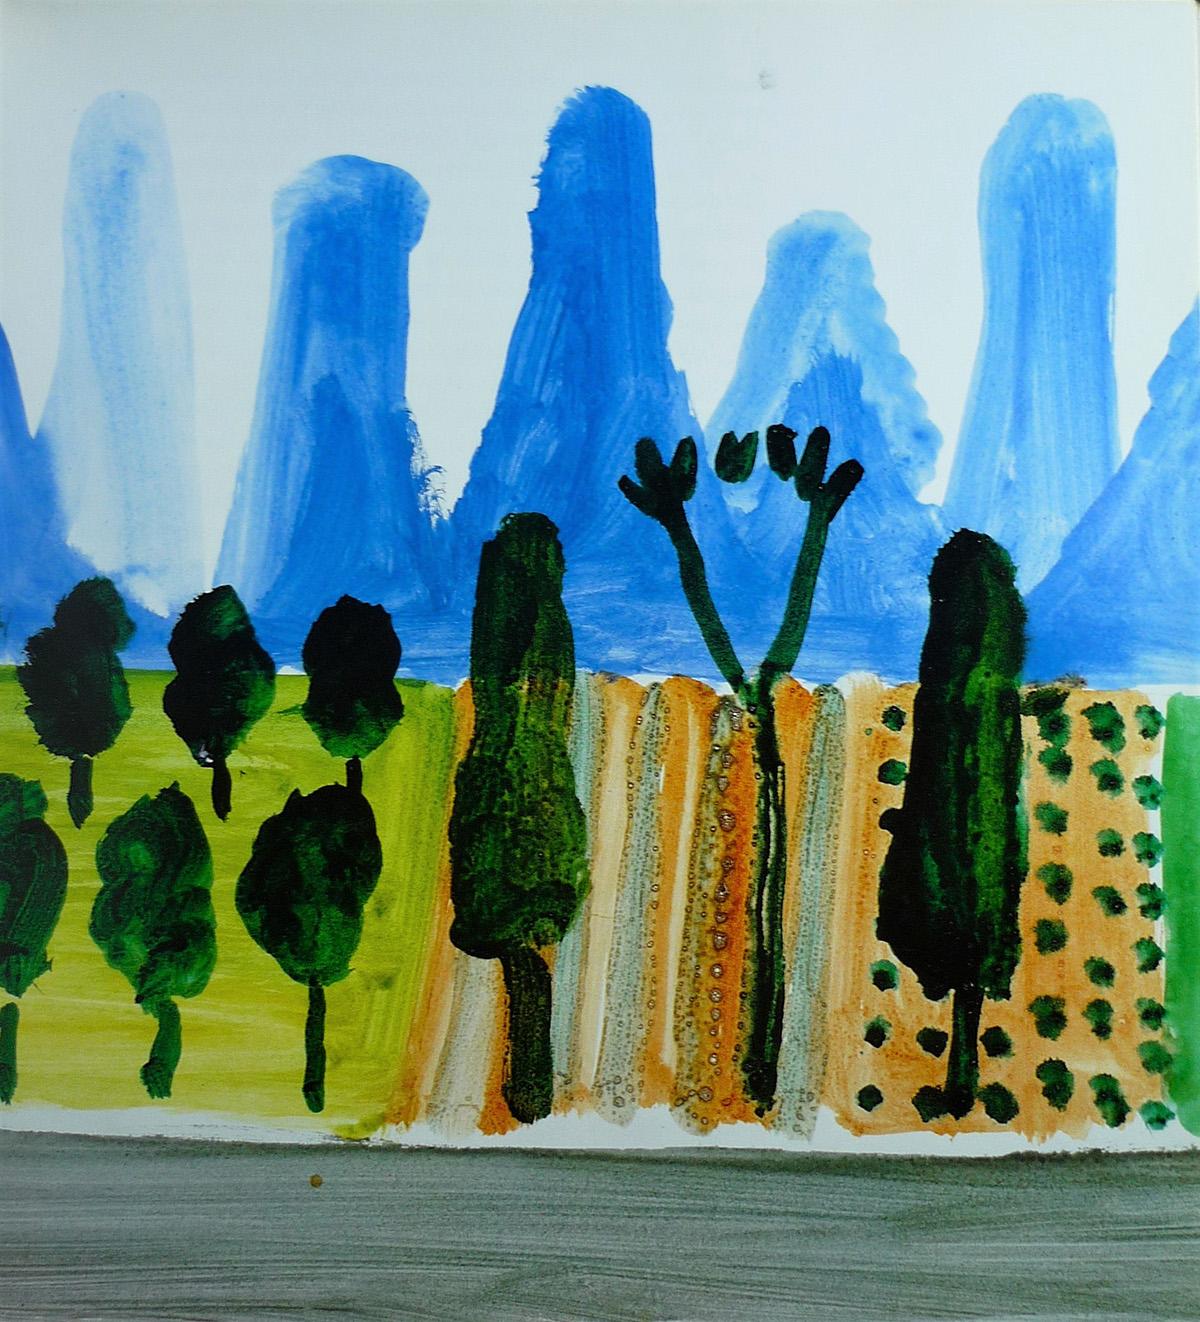 Hockney: The Greatest Living British Artist